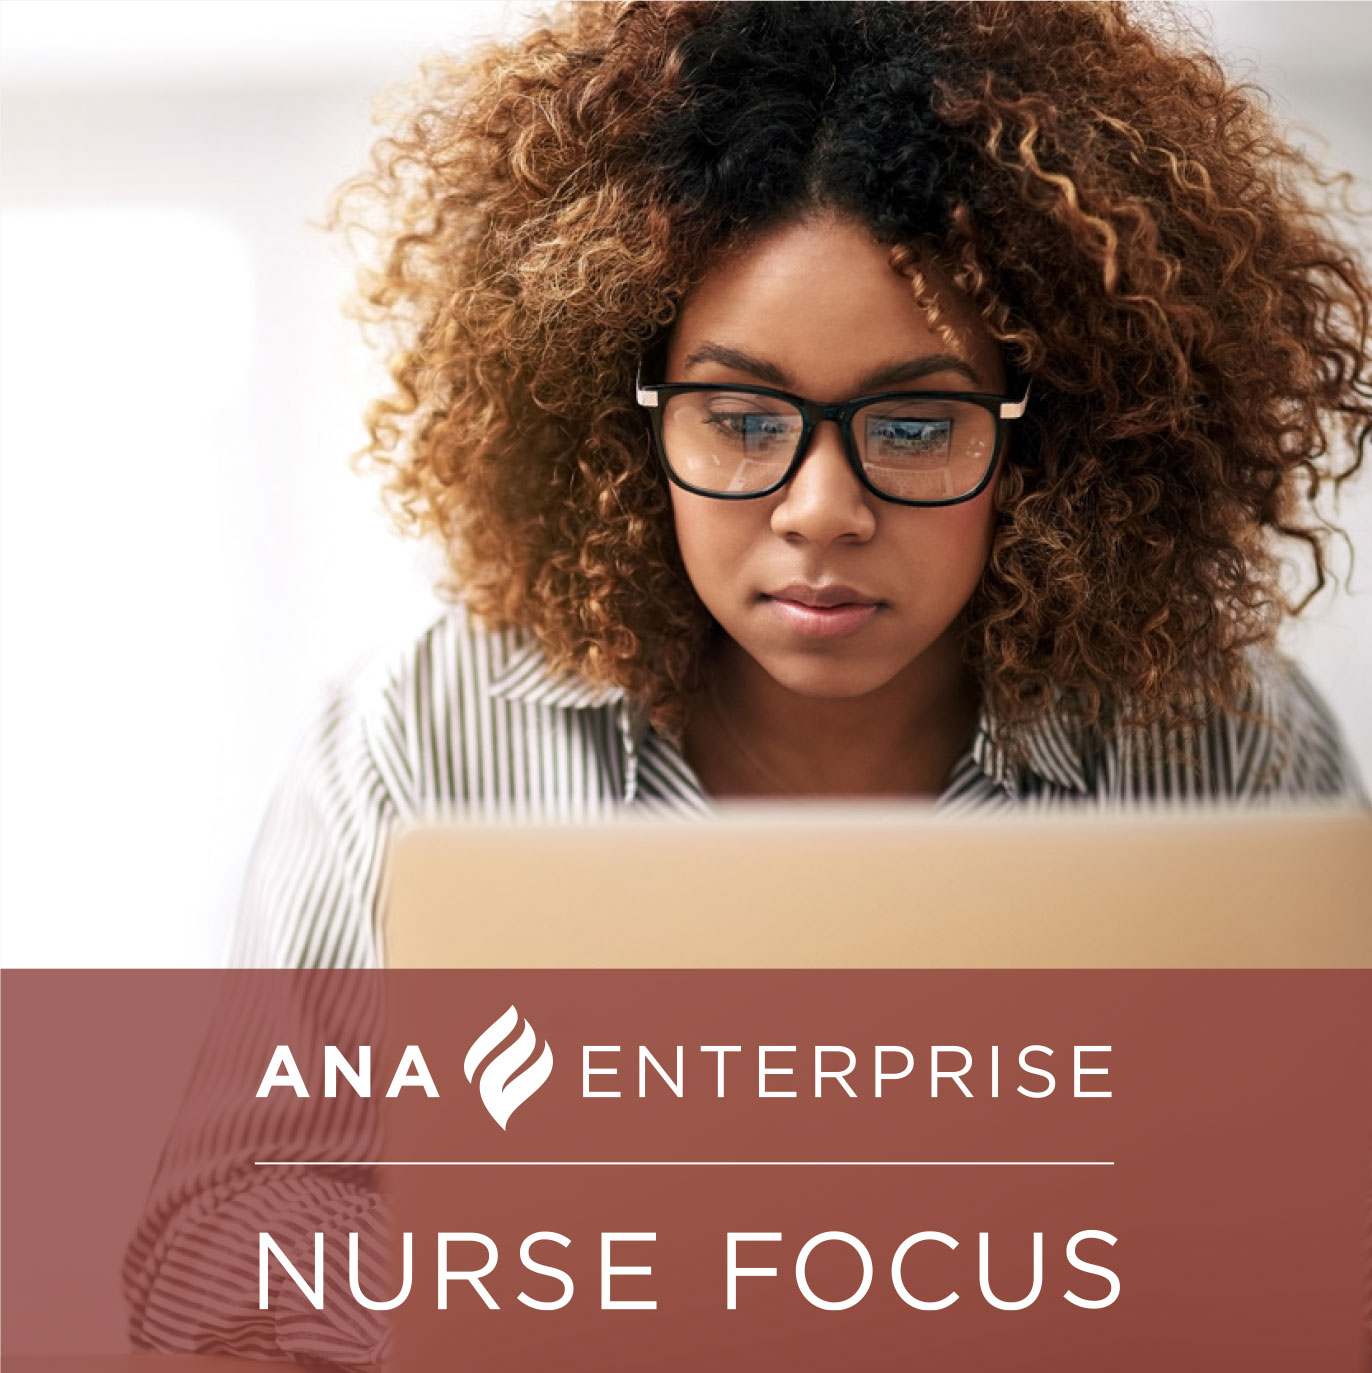 ANA Enterprise Nurse Focus